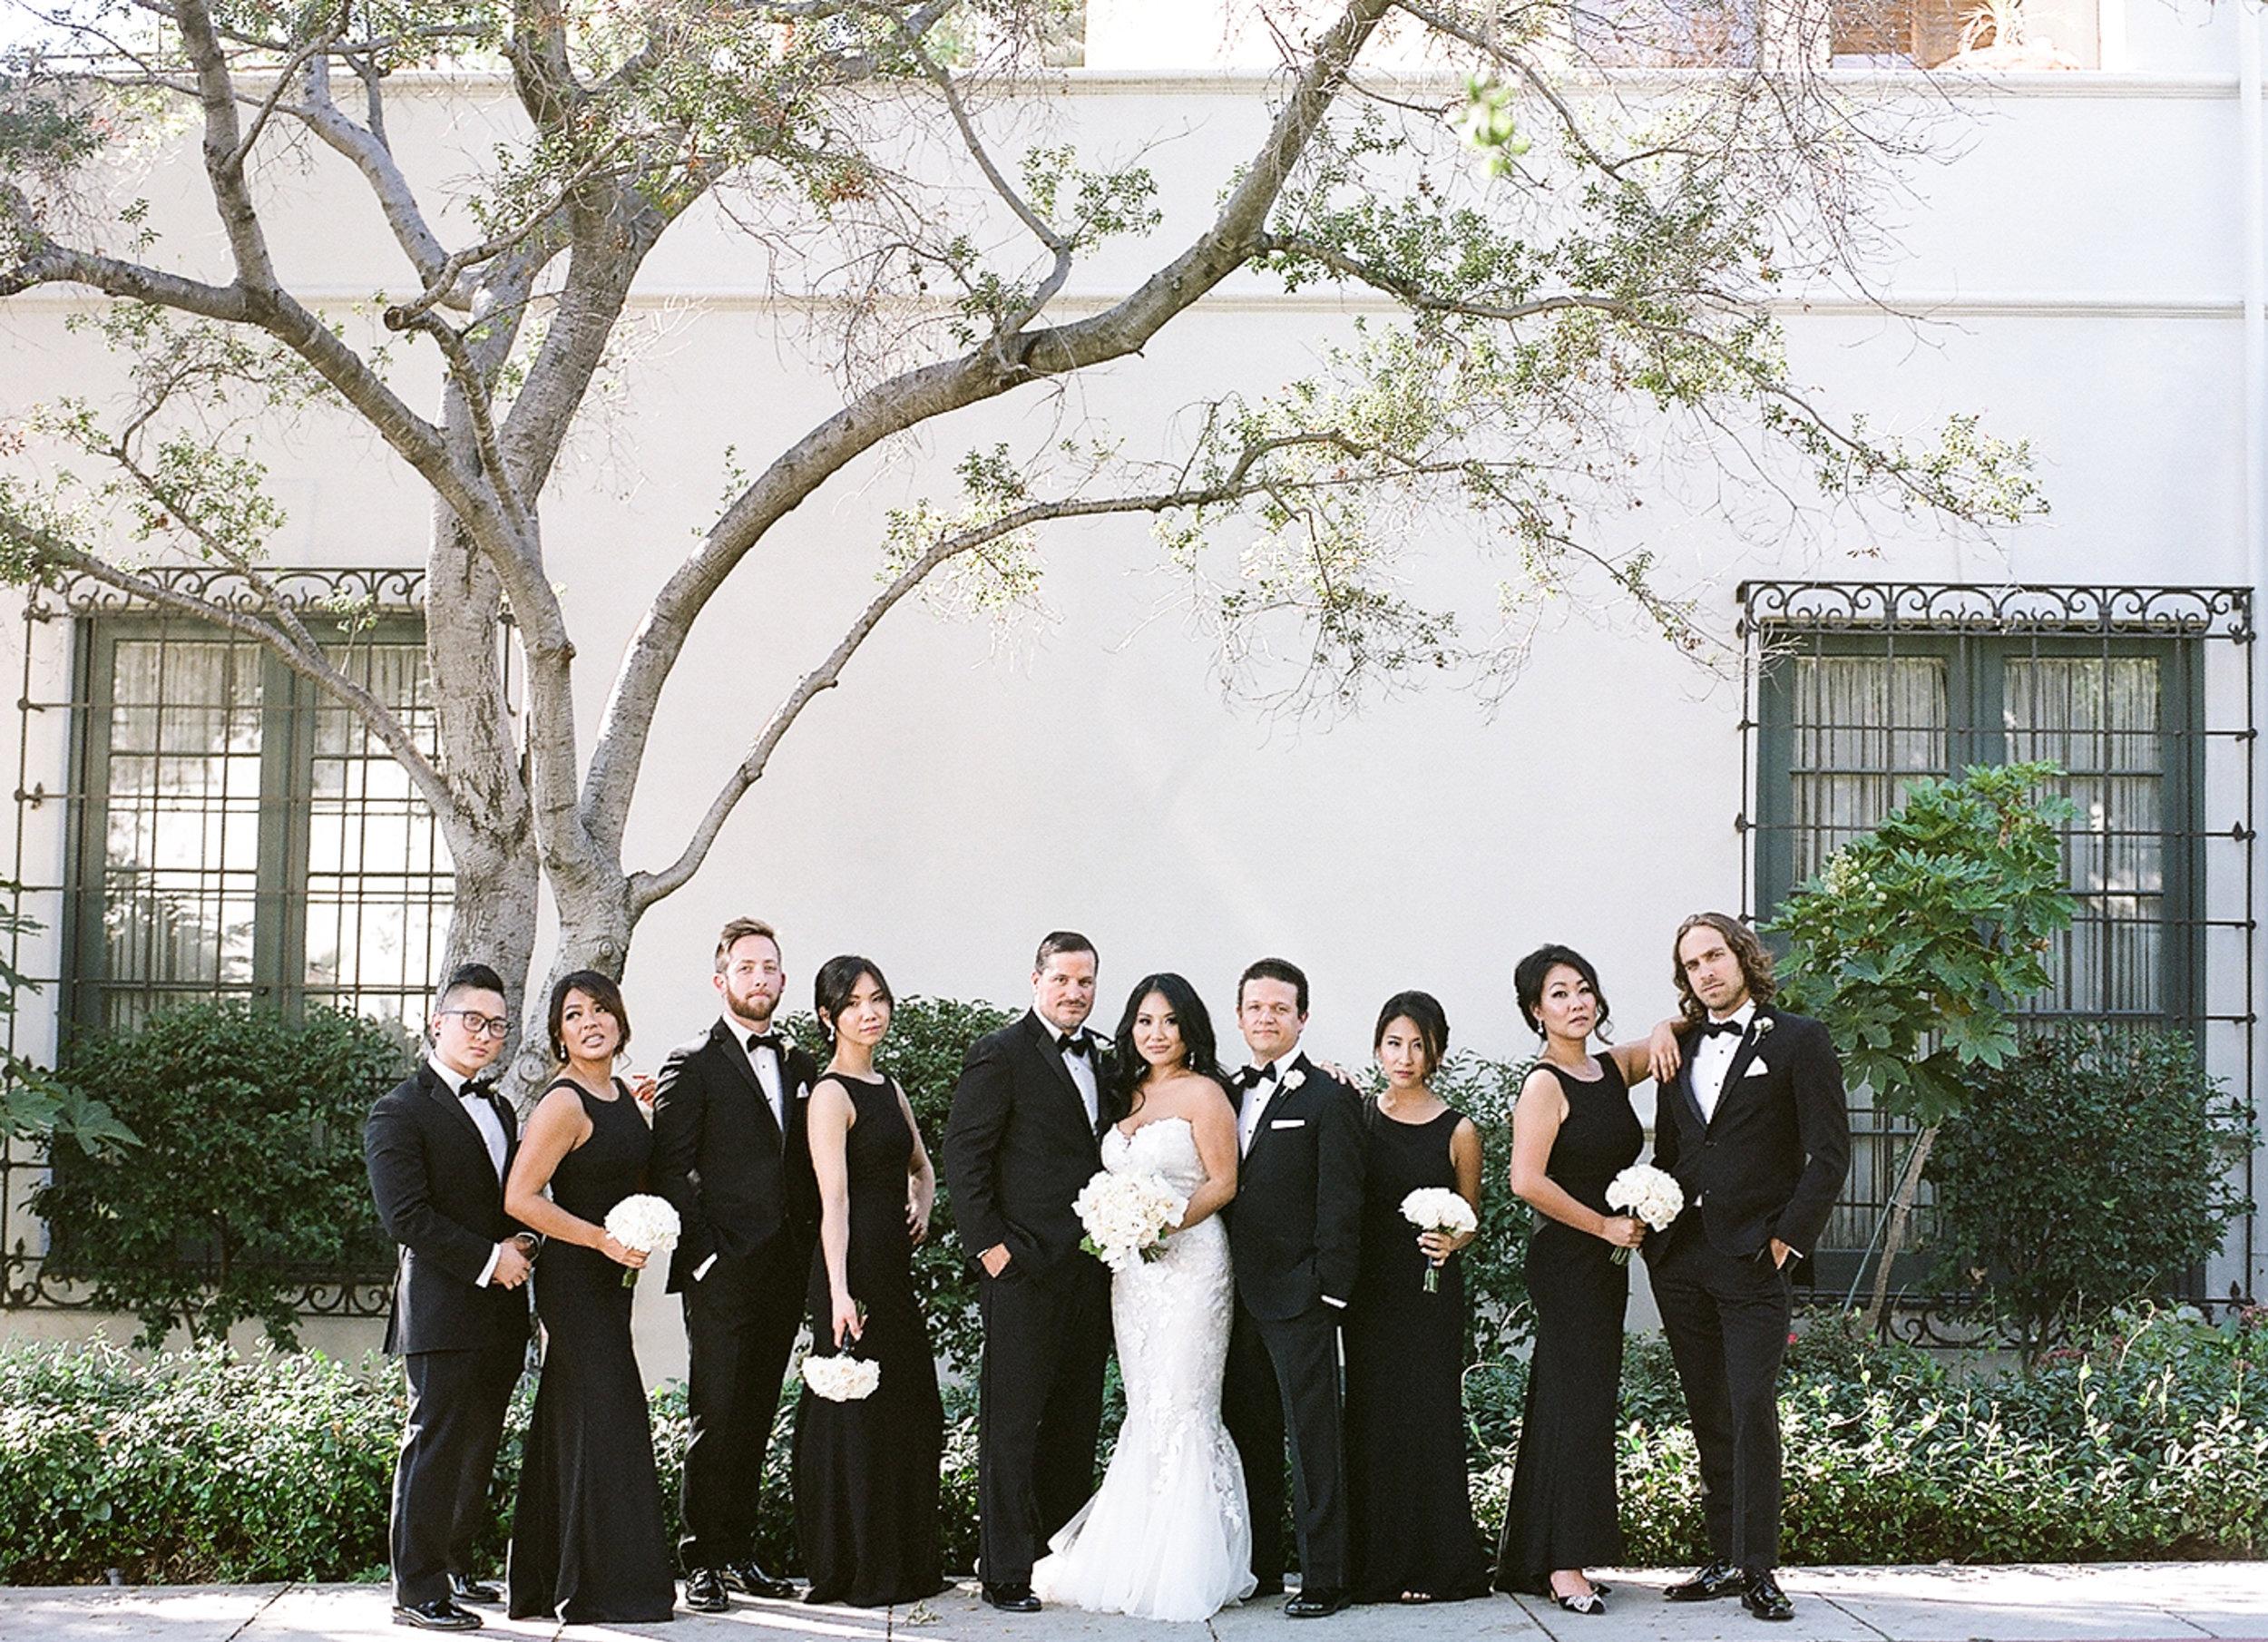 Bonphotage California Fine Art Wedding Photography